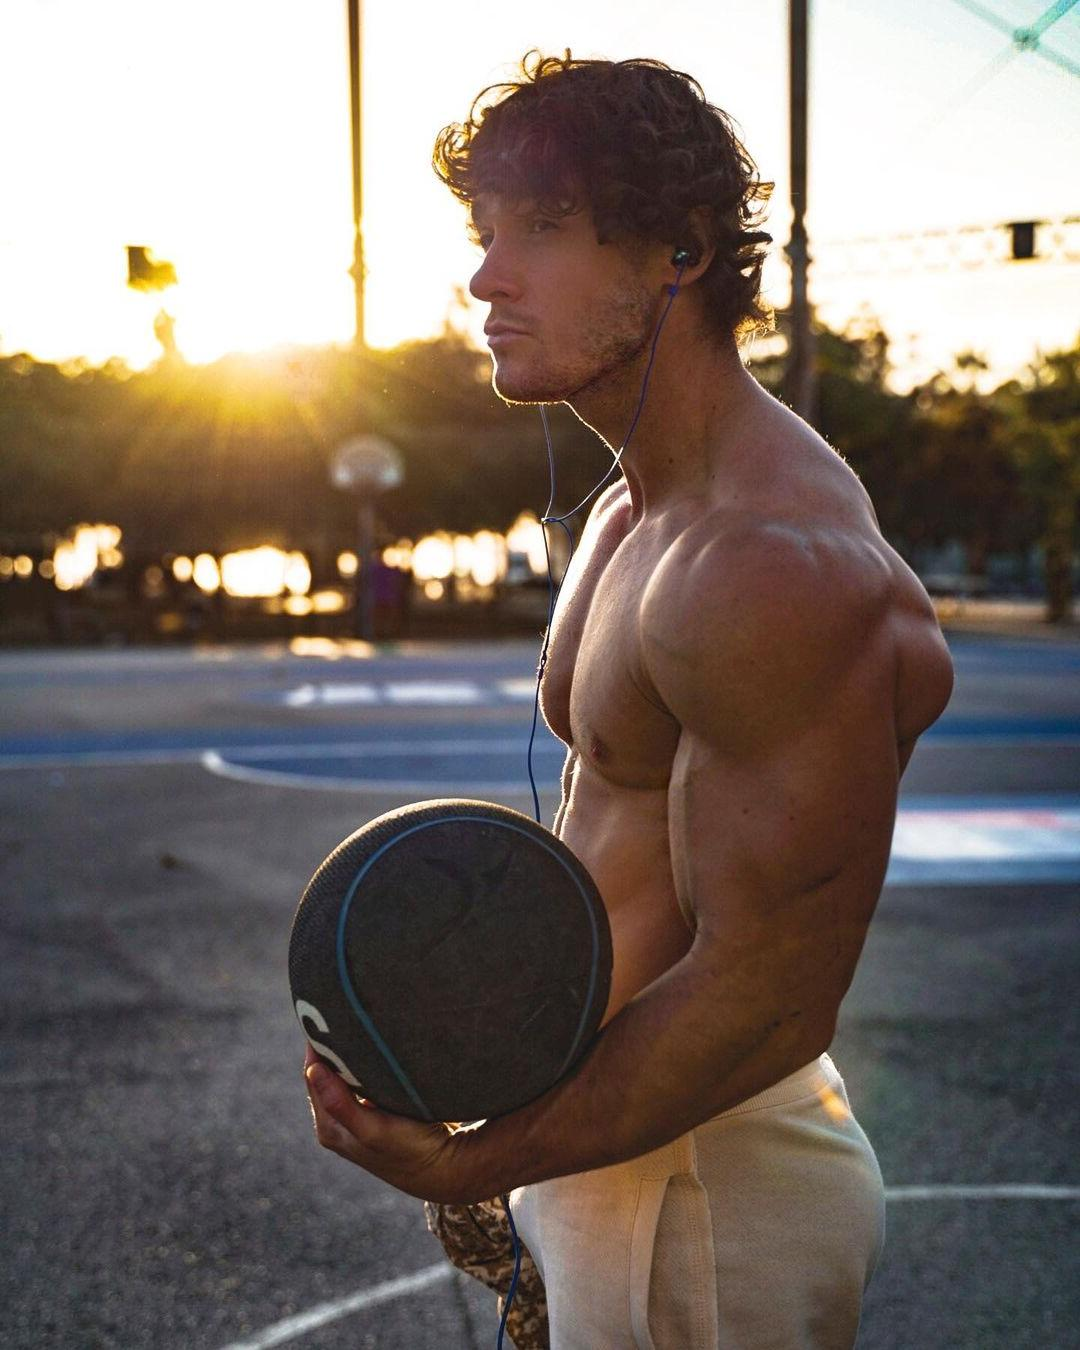 sexy-barechest-men-muscles-owen-harrison-basketball-player-big-pecs-swole-biceps